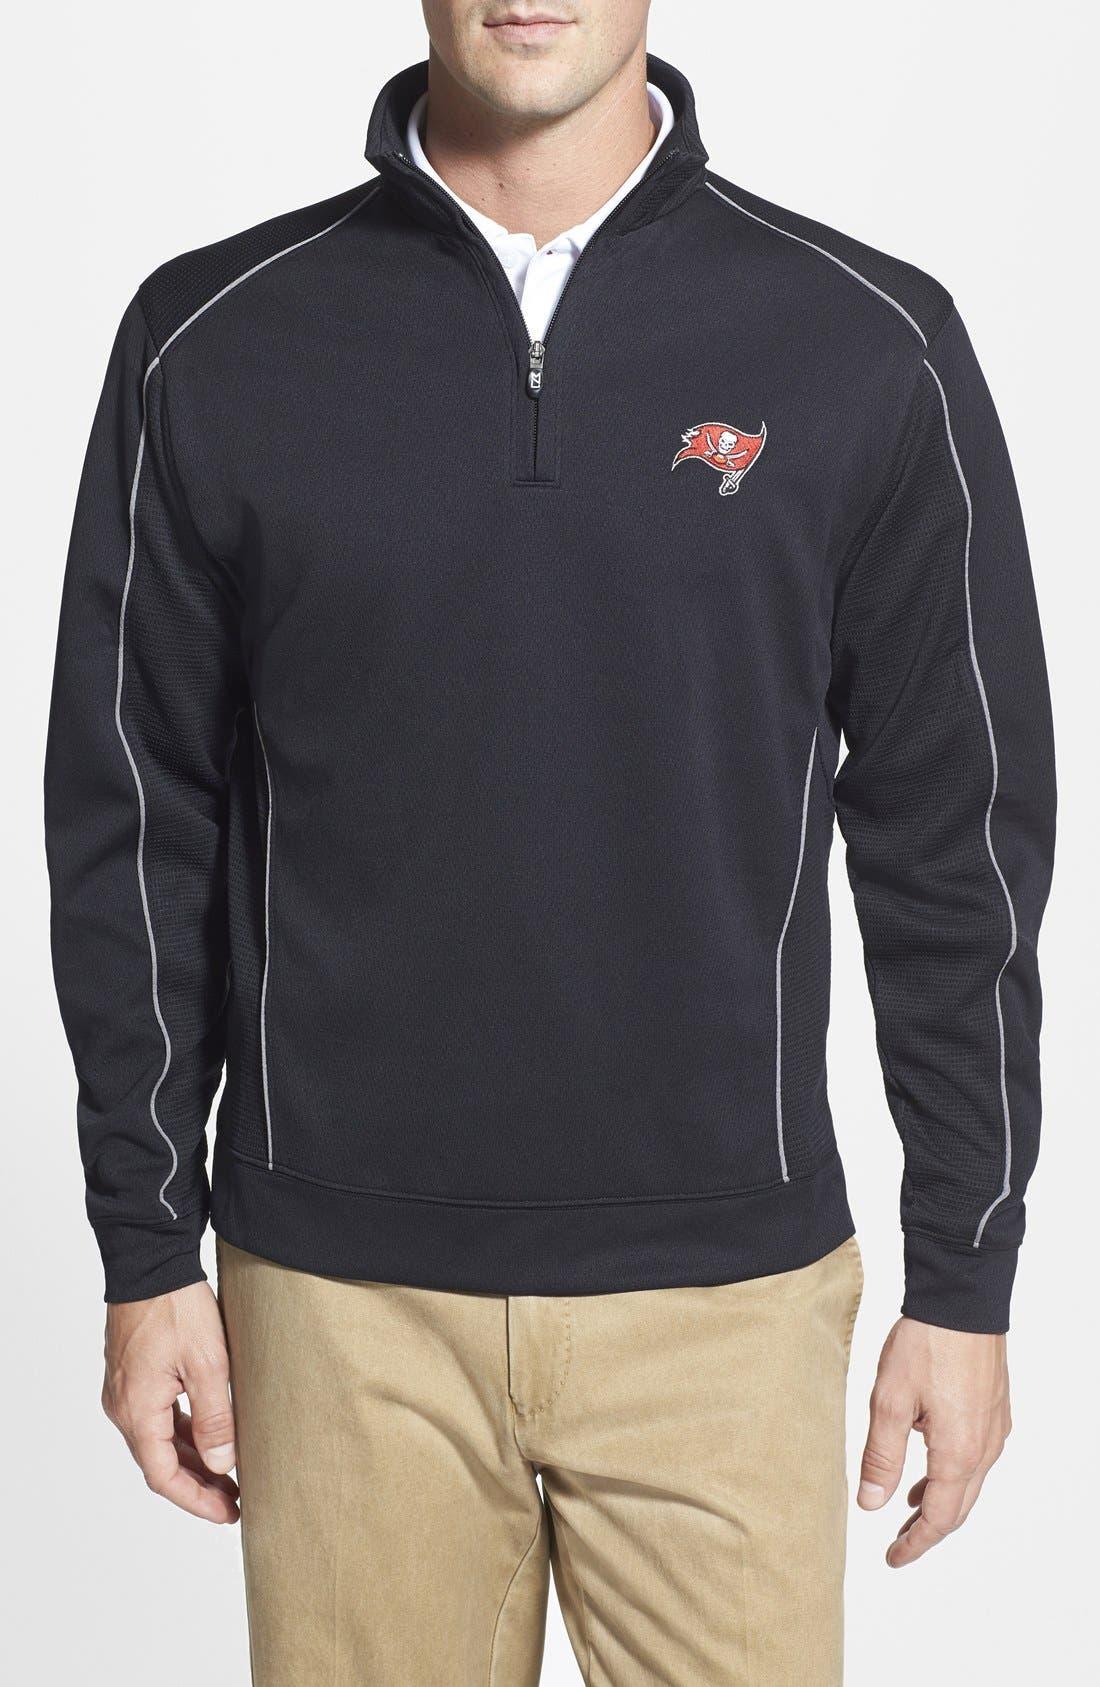 Tampa Bay Buccaneers - Edge DryTec Moisture Wicking Half Zip Pullover,                         Main,                         color,